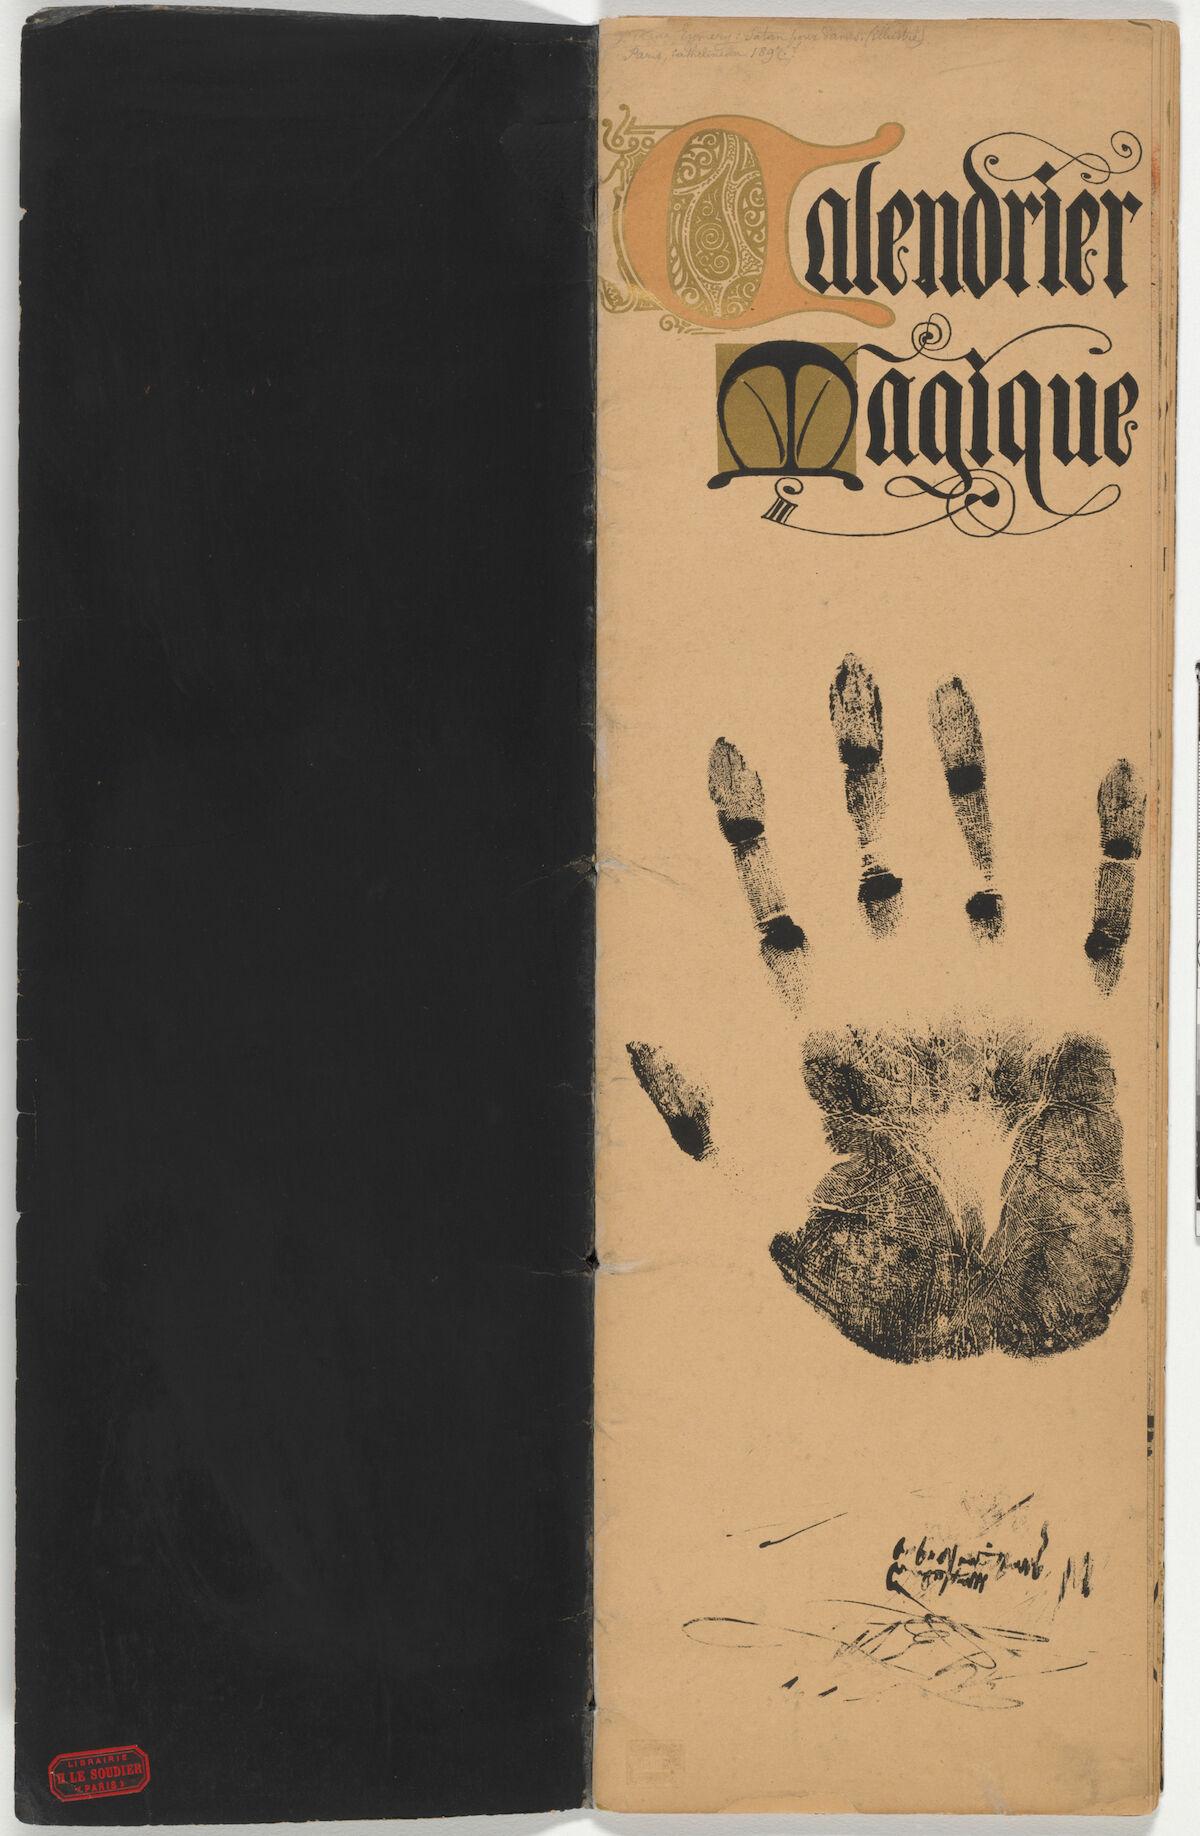 Manuel Orazi, Magic Calendar, 1895. The Baltimore Museum of Art.